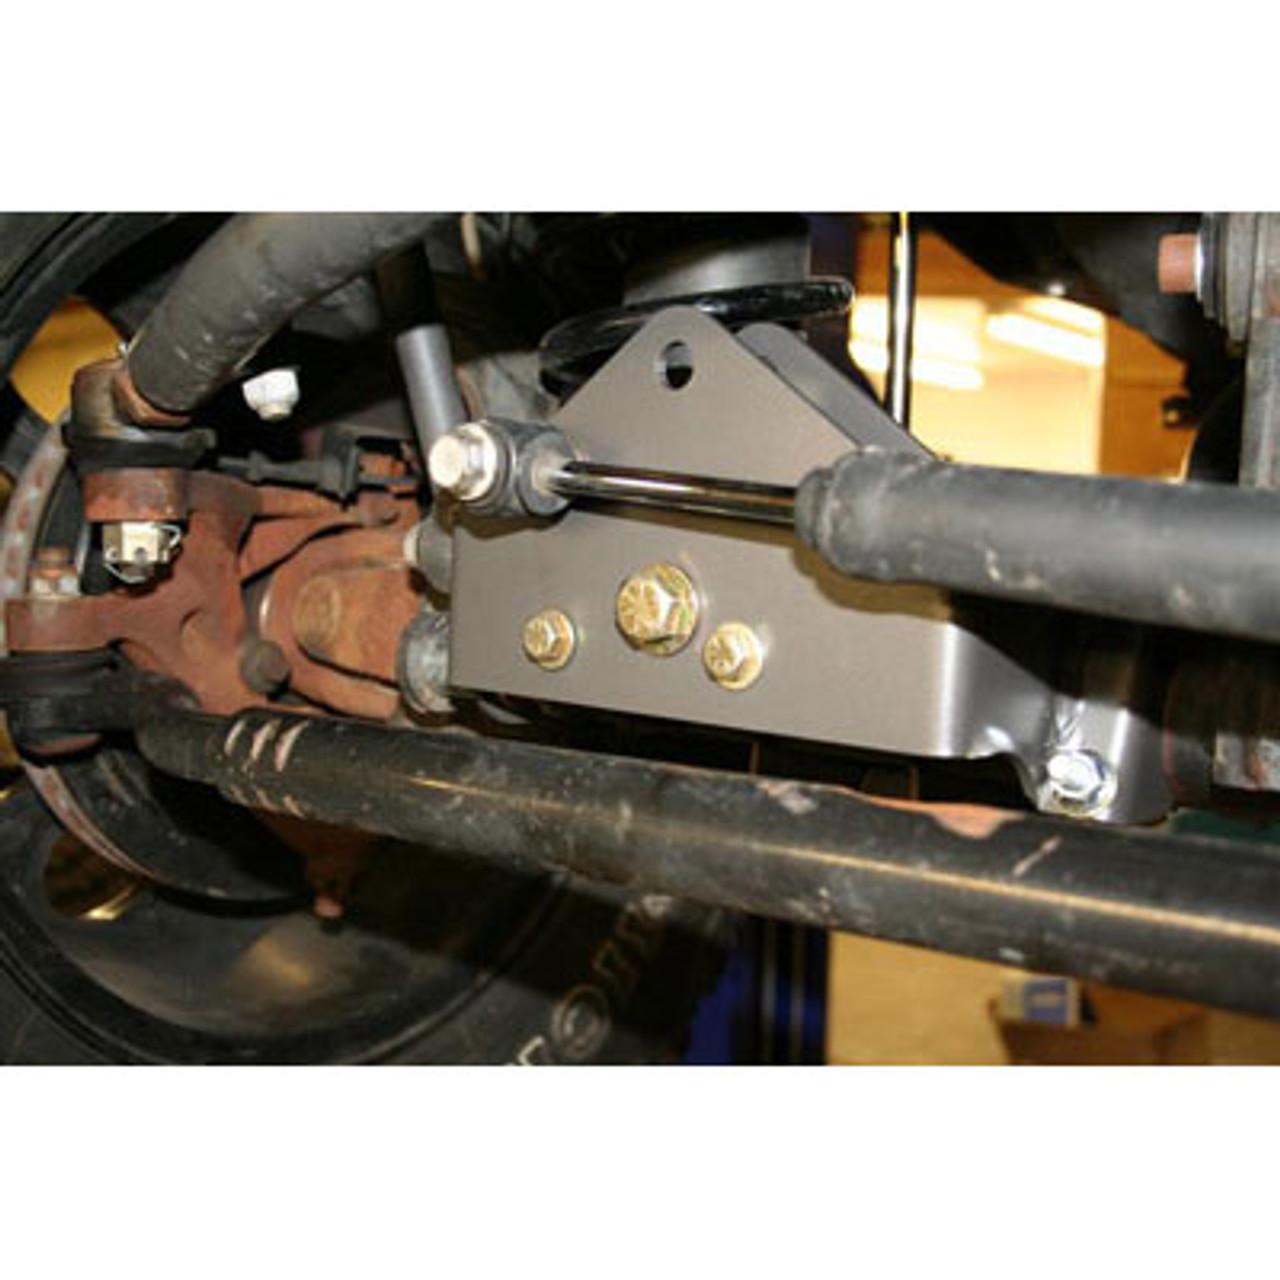 Synergy 8055 Front Track Bar Relocation Bracket for Jeep Wrangler JK 2007+